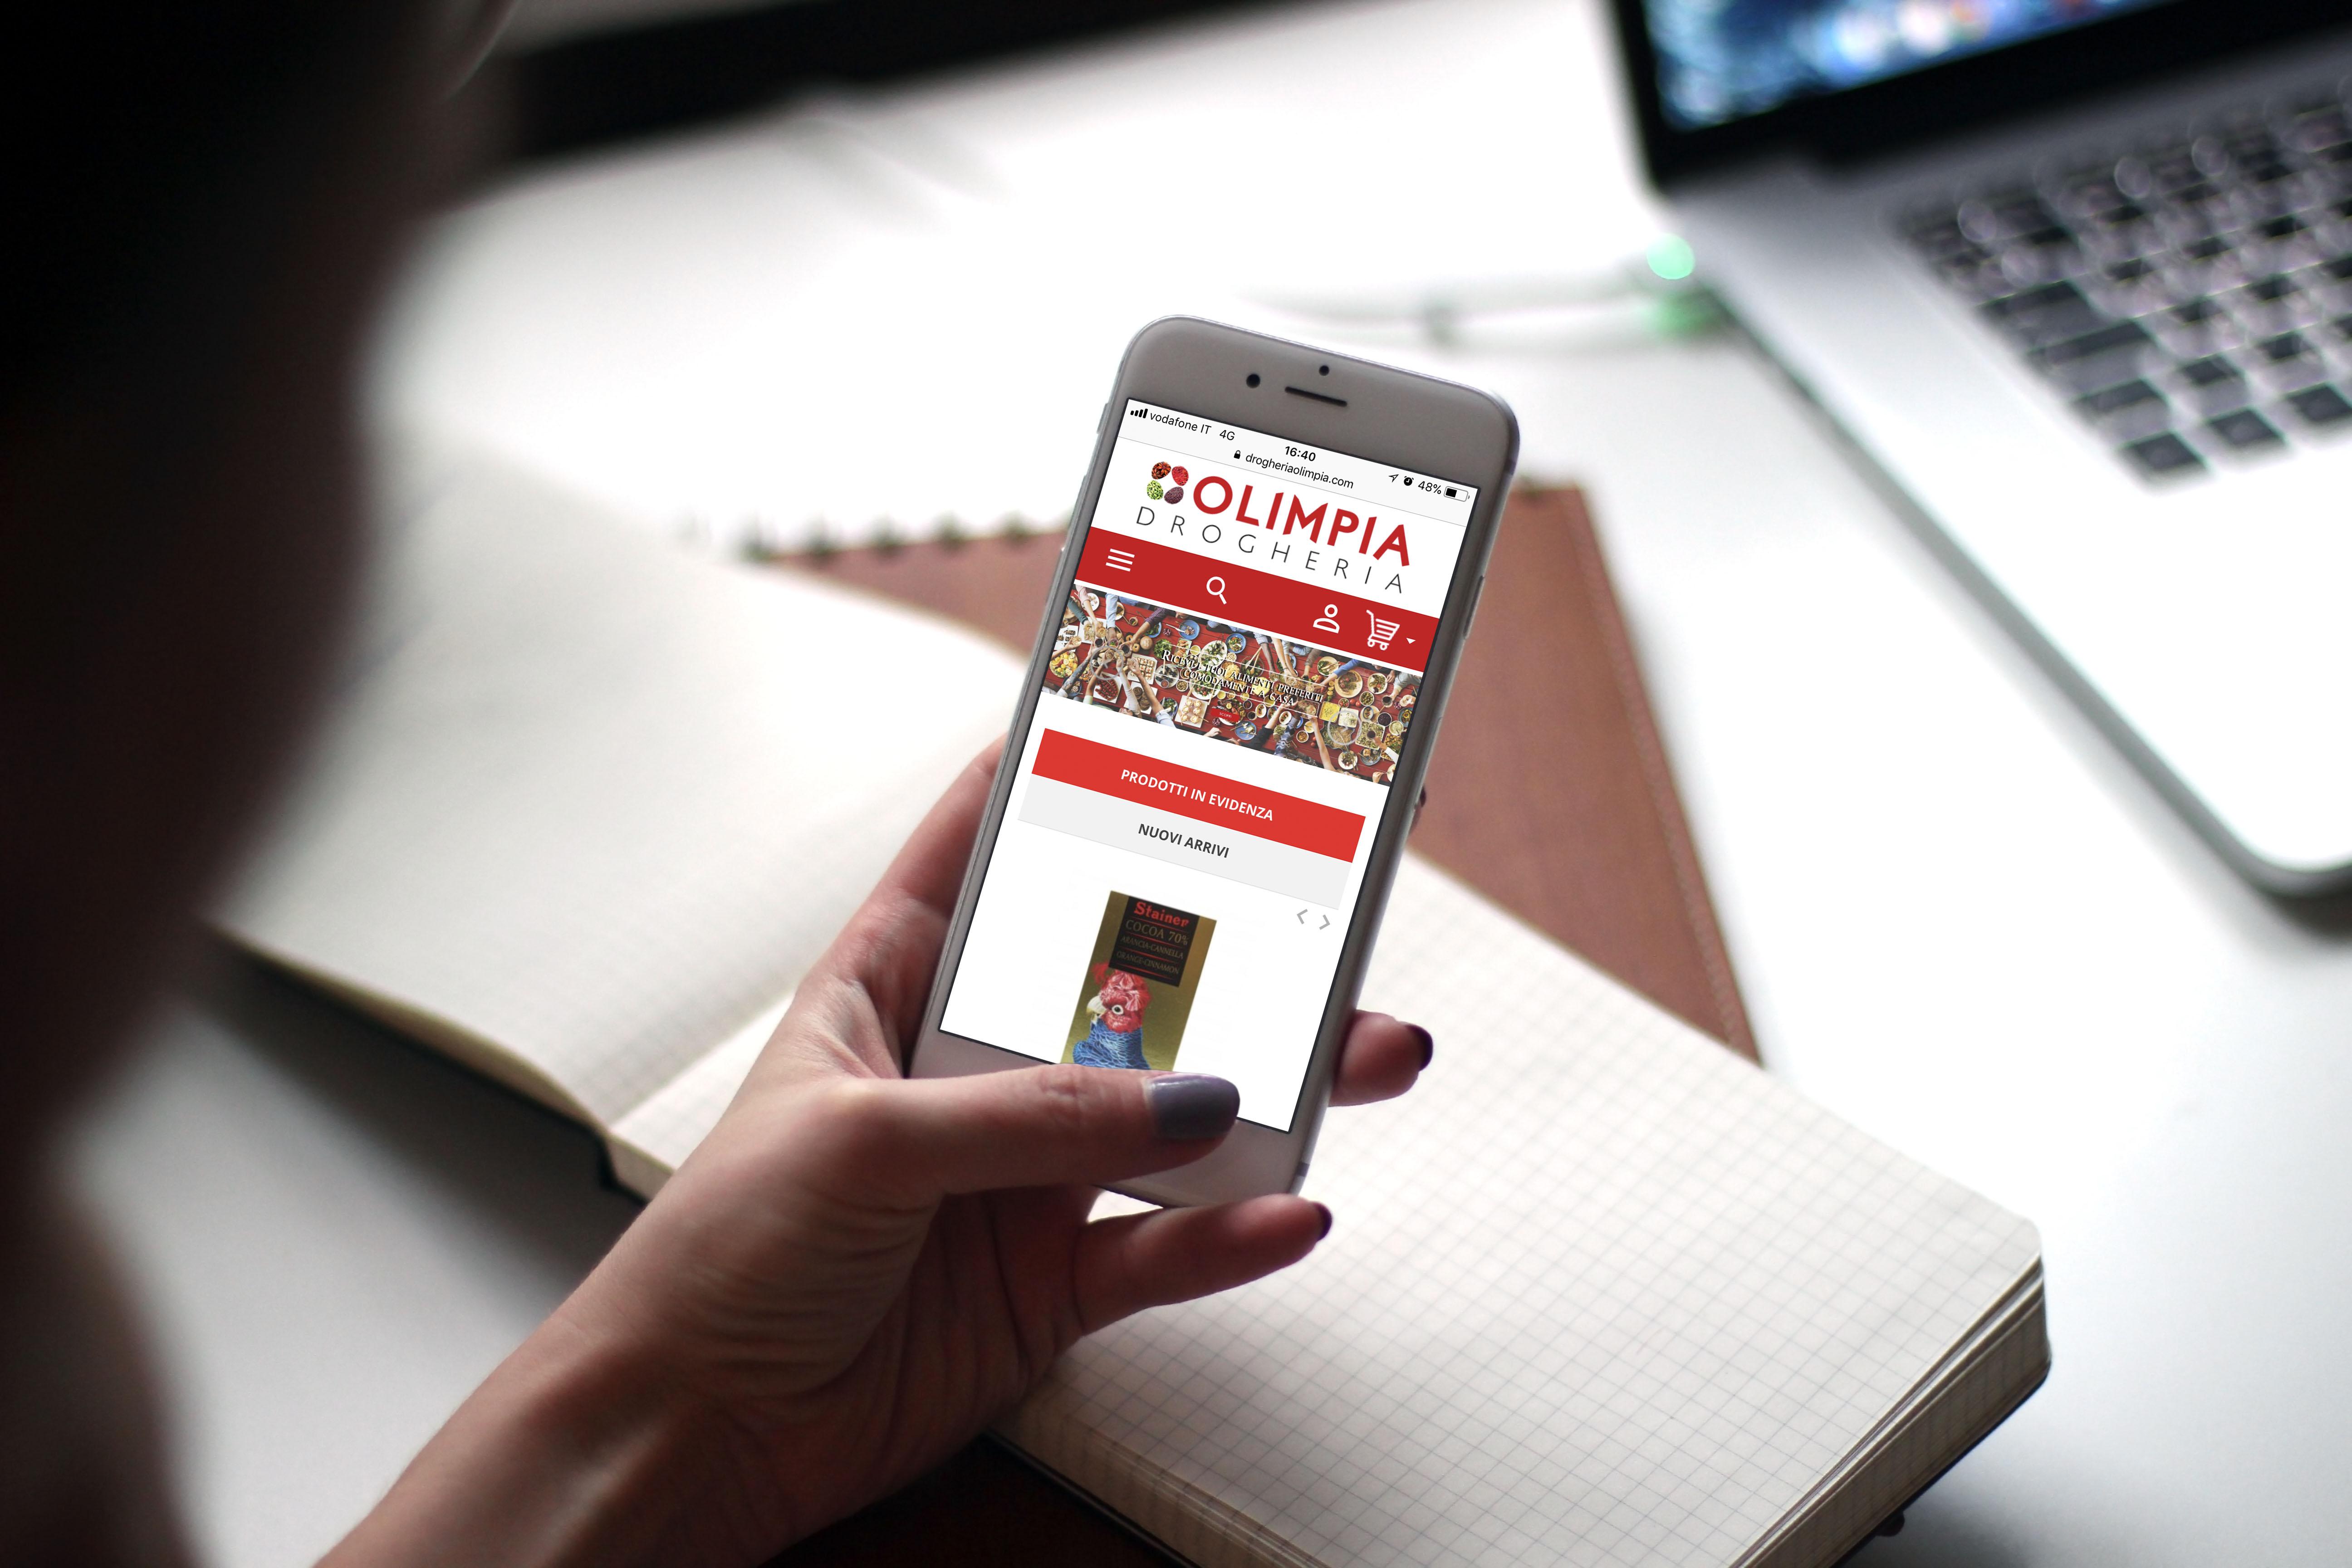 drogheria olimpia shop online